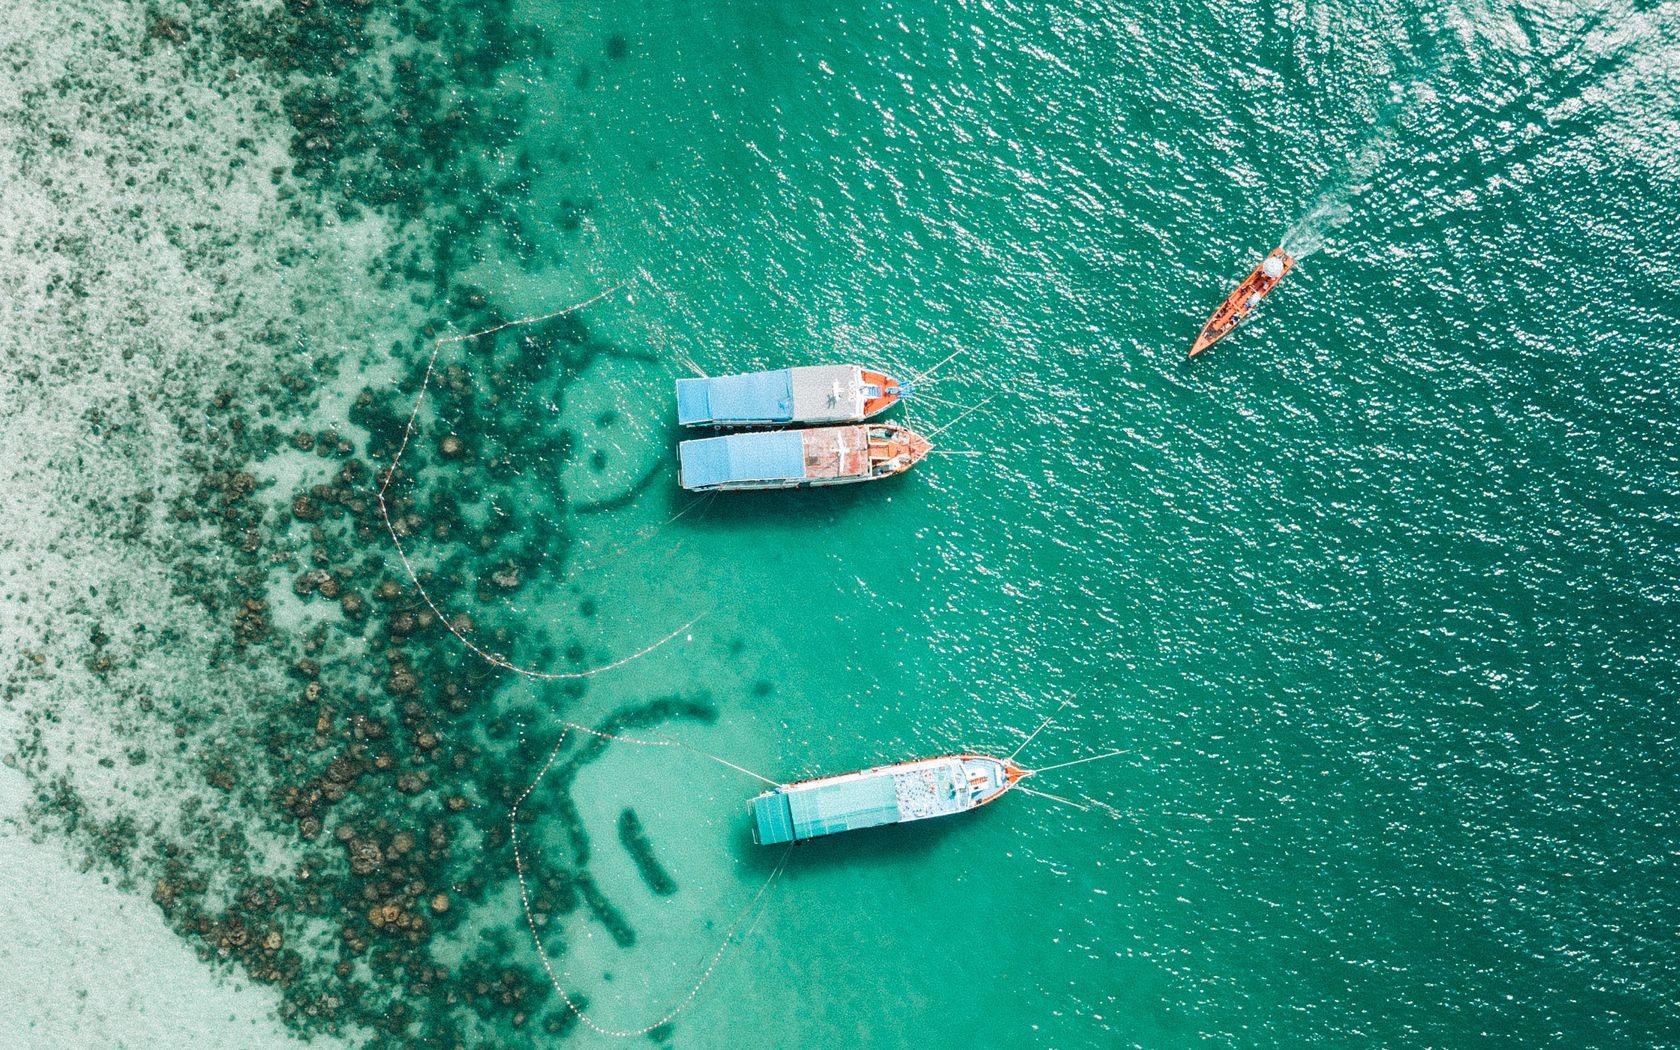 1680x1050 Wallpaper shore, boats, sandbar, ocean, moored, aerial view